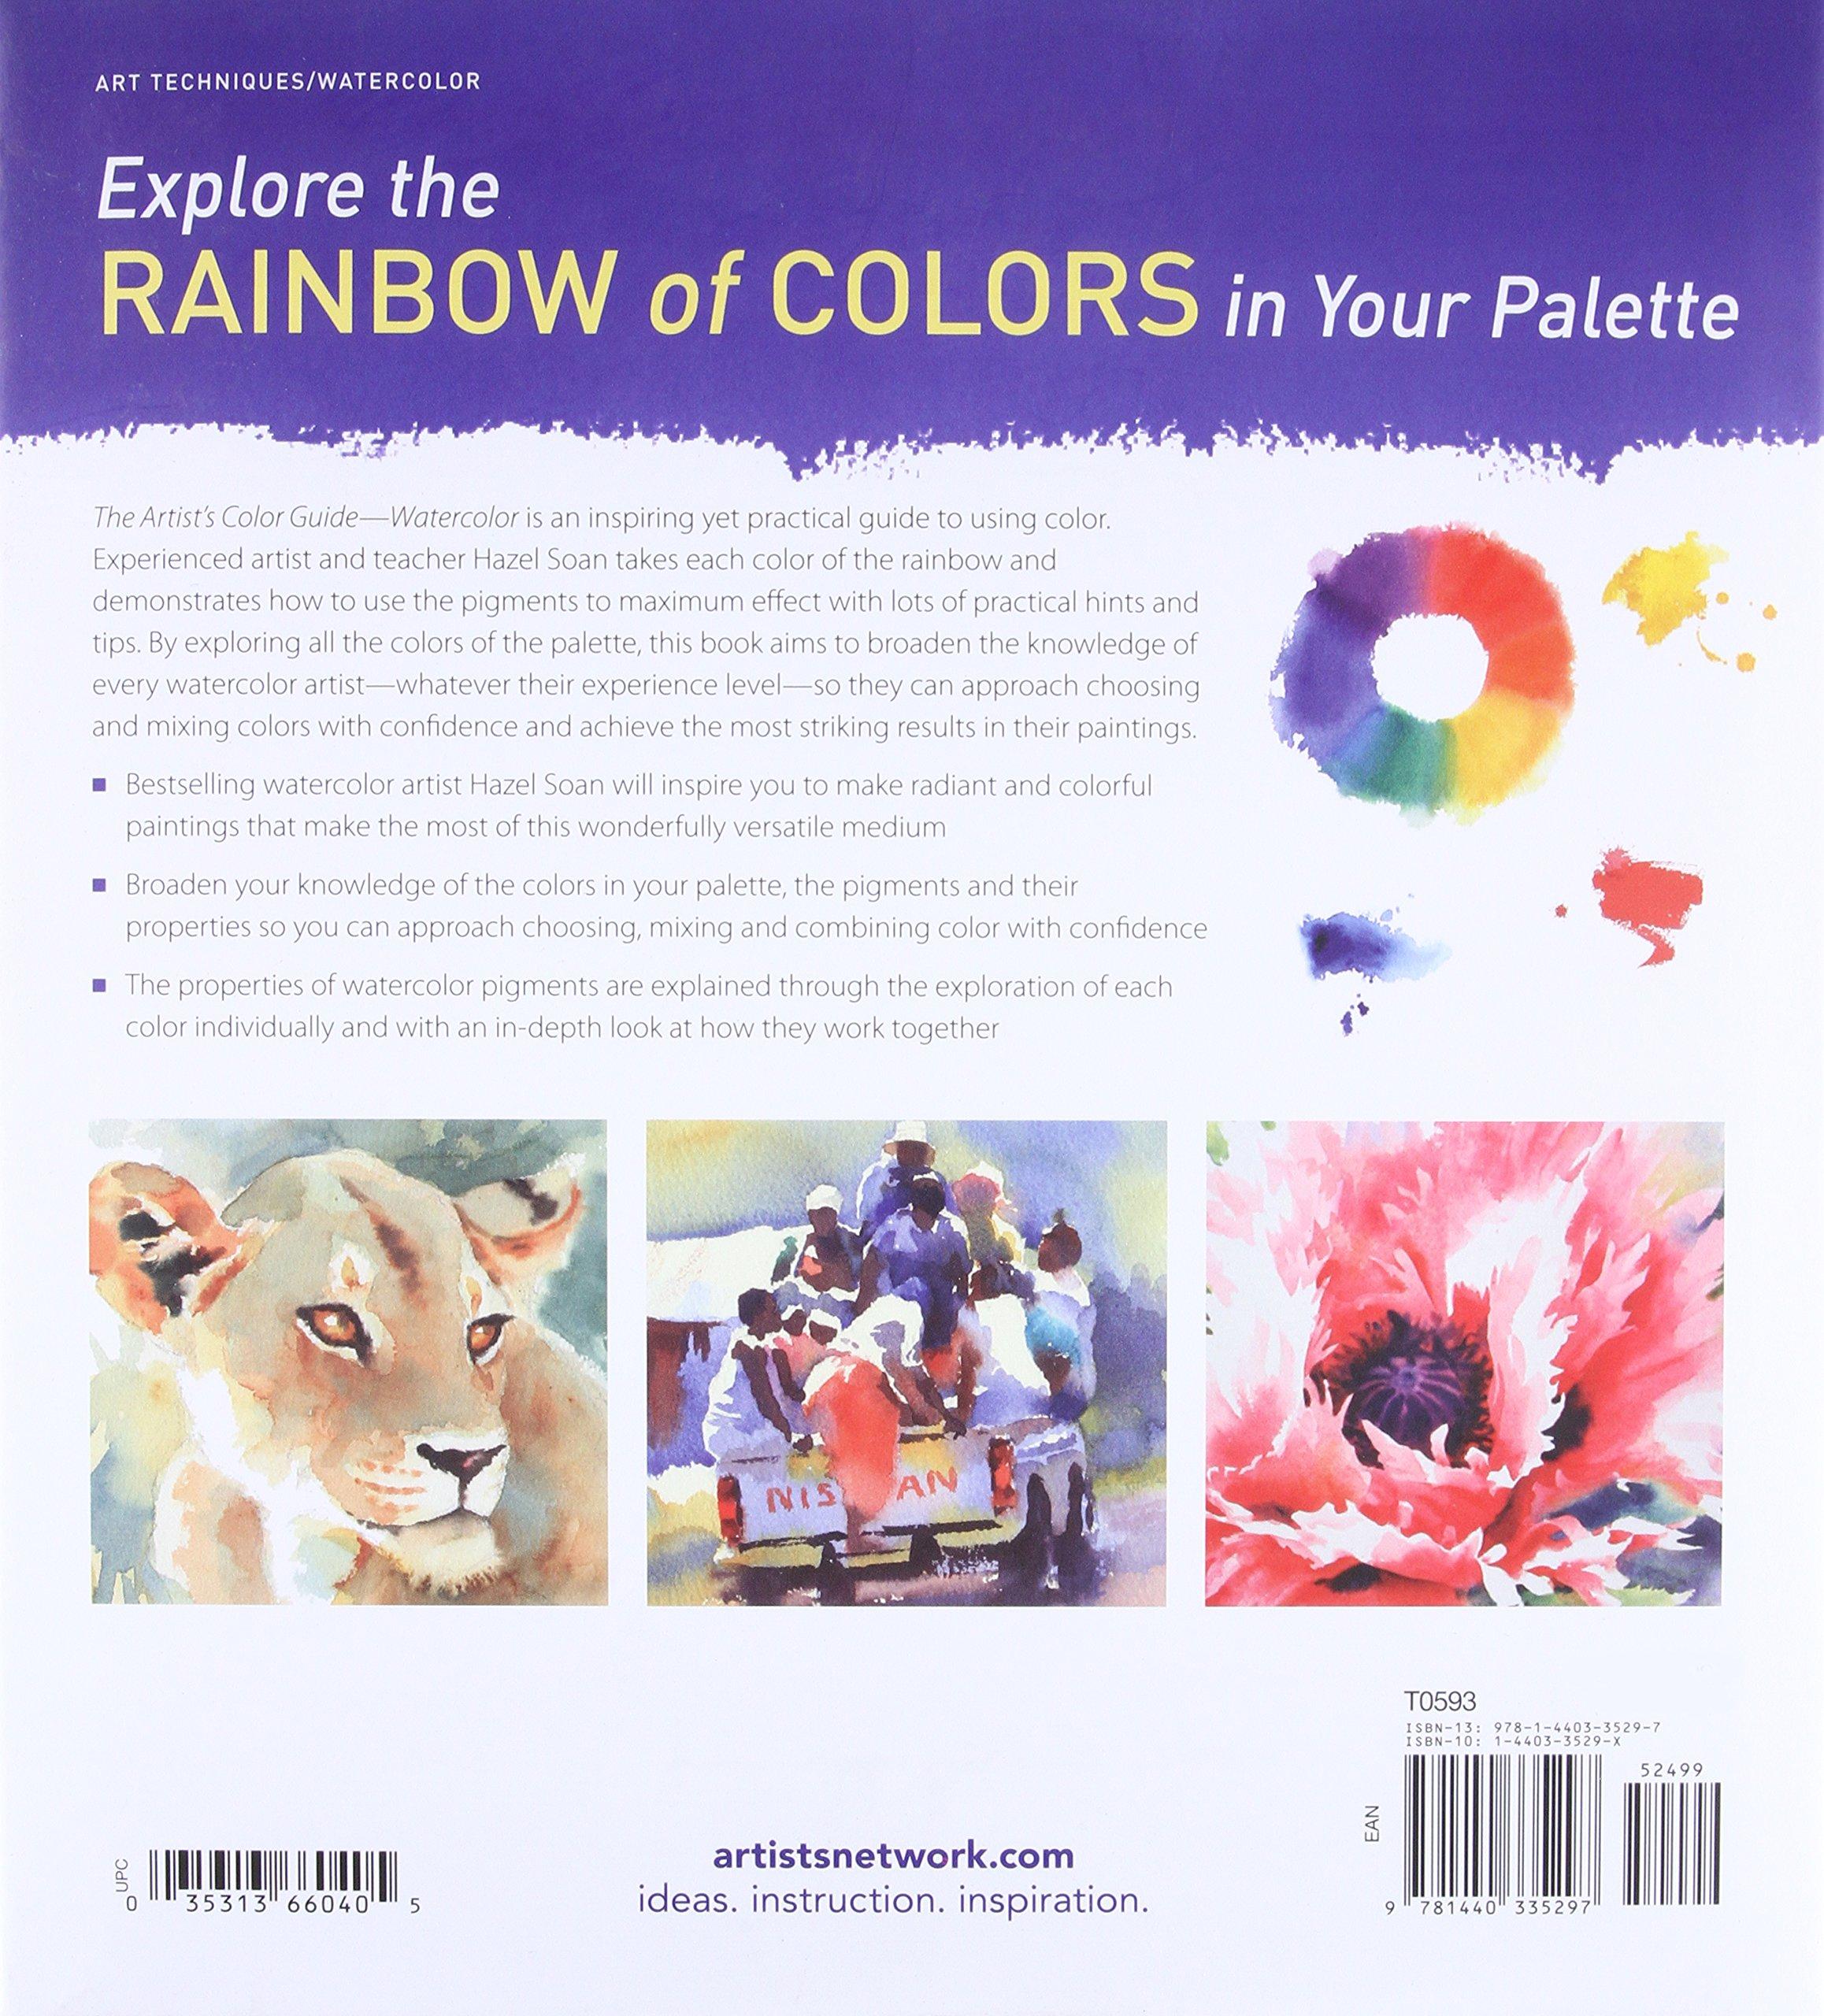 Watercolor artist magazine customer service - The Artist S Color Guide Watercolor Understanding Palette Pigments And Properties Hazel Soan 0035313660405 Amazon Com Books